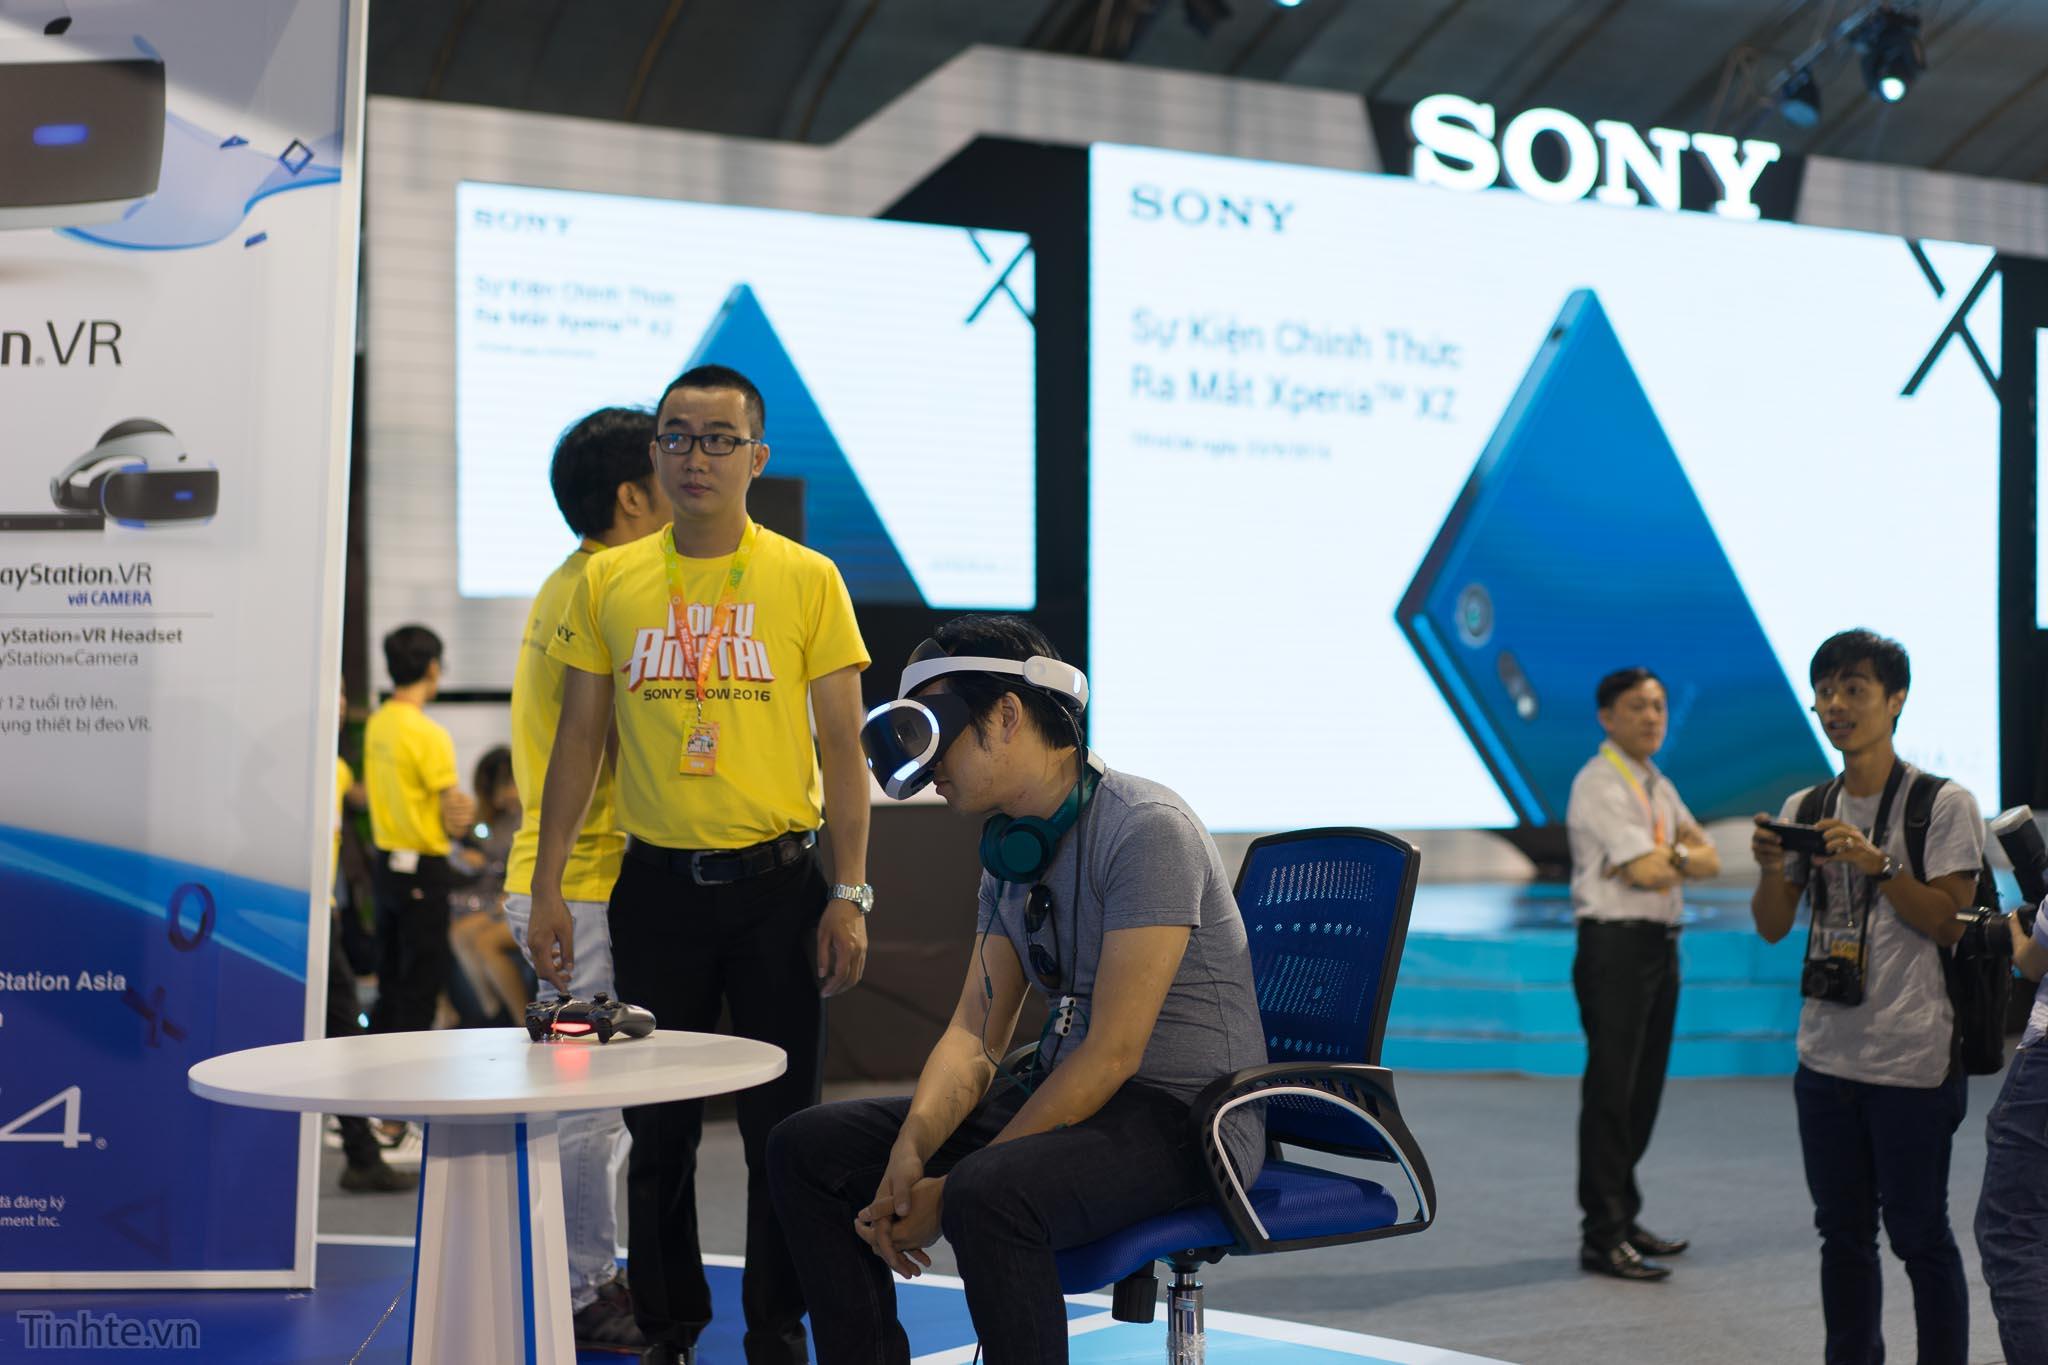 Sony_Show_2016_tinhte.vn-14.jpg